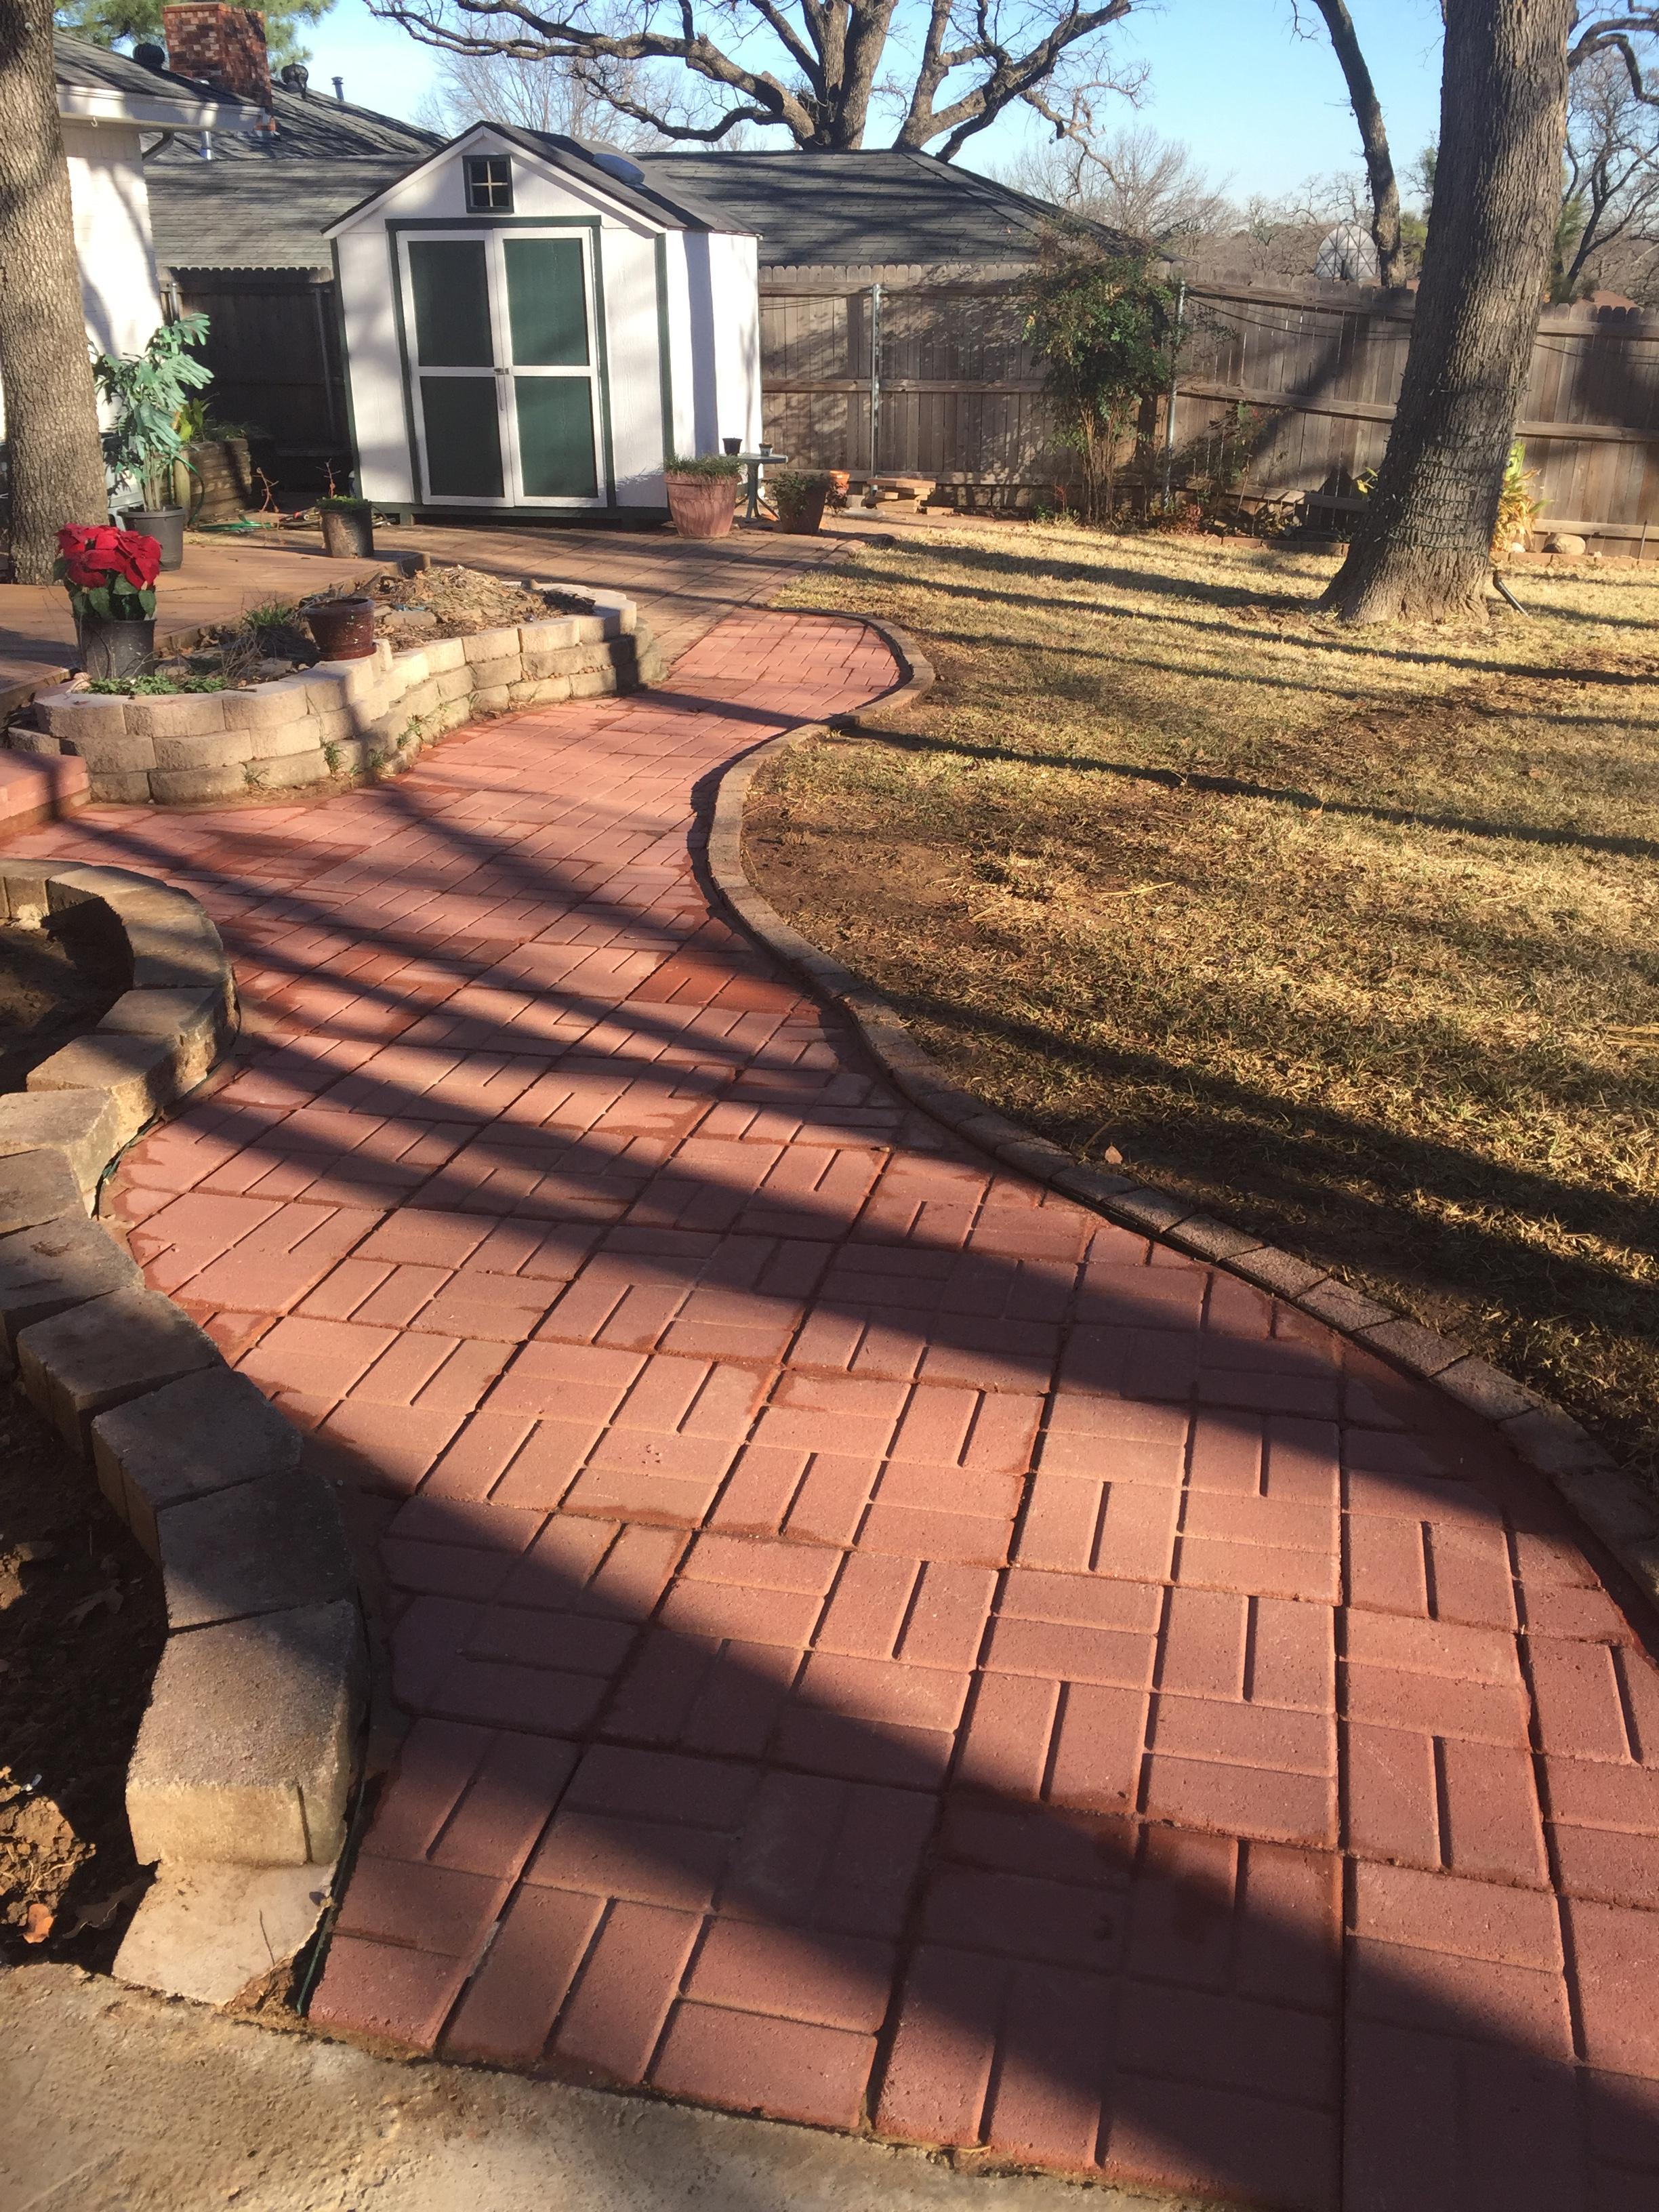 Sg landscape and outdoors llc arlington texas tx for Home turf texas landscape design llc